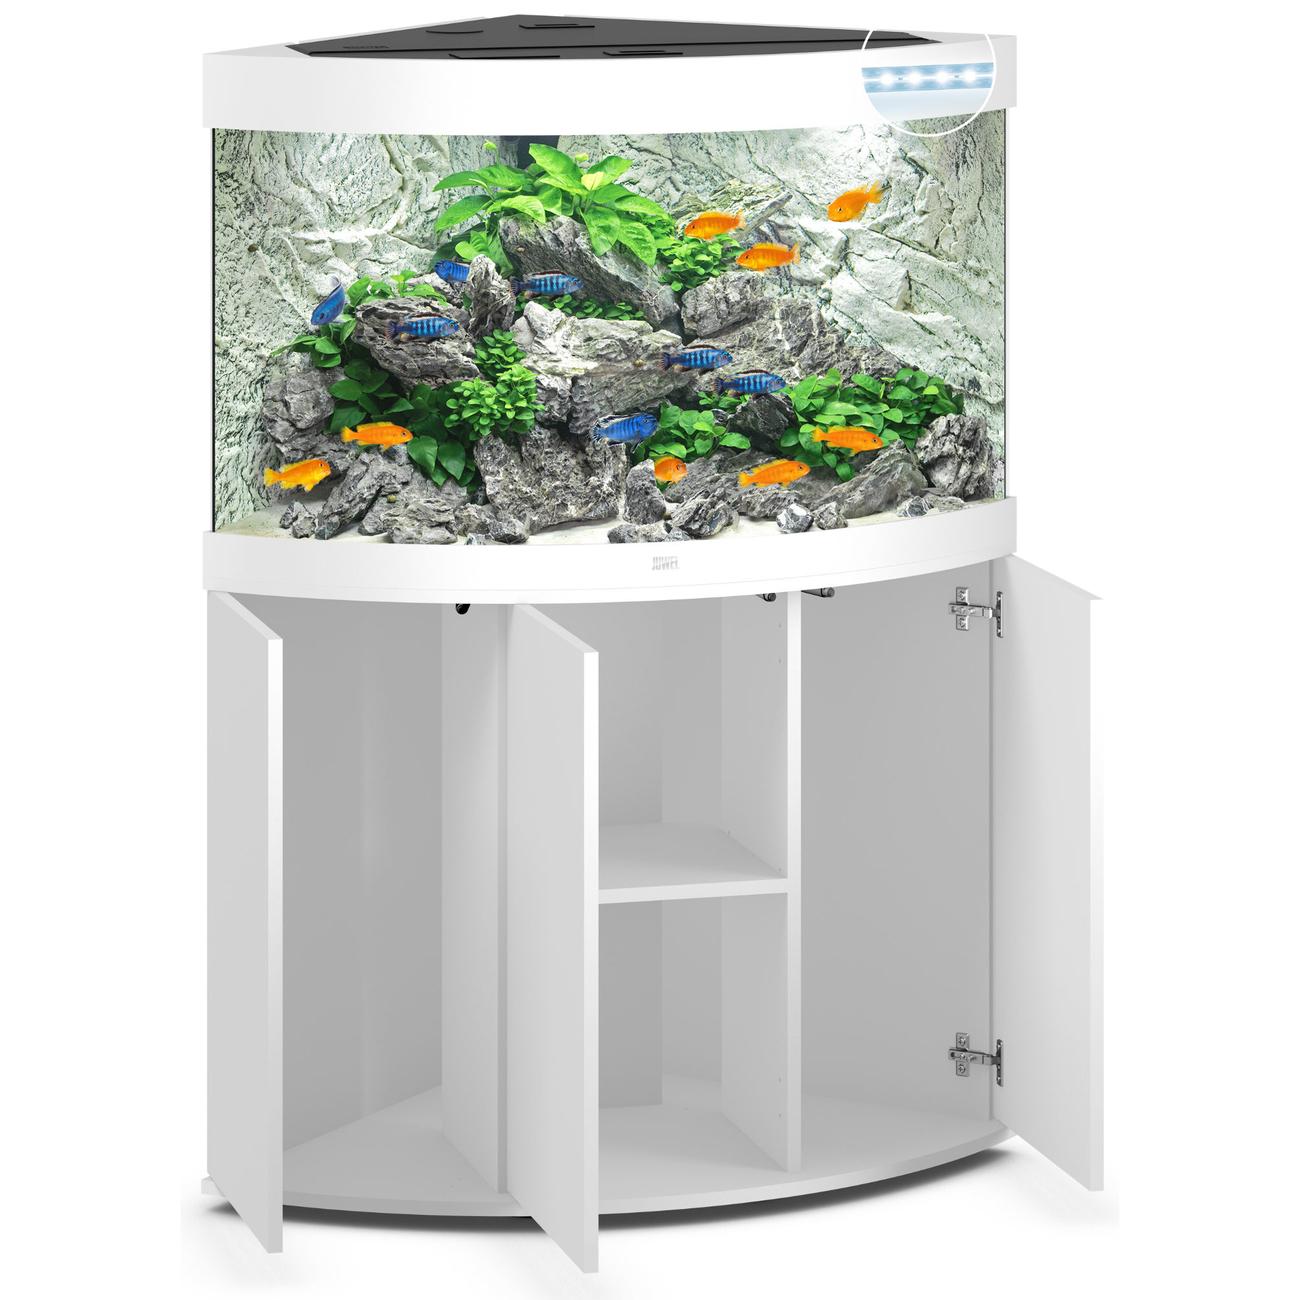 Juwel Trigon 190 LED Eck-Aquarium mit Unterschrank, Bild 9